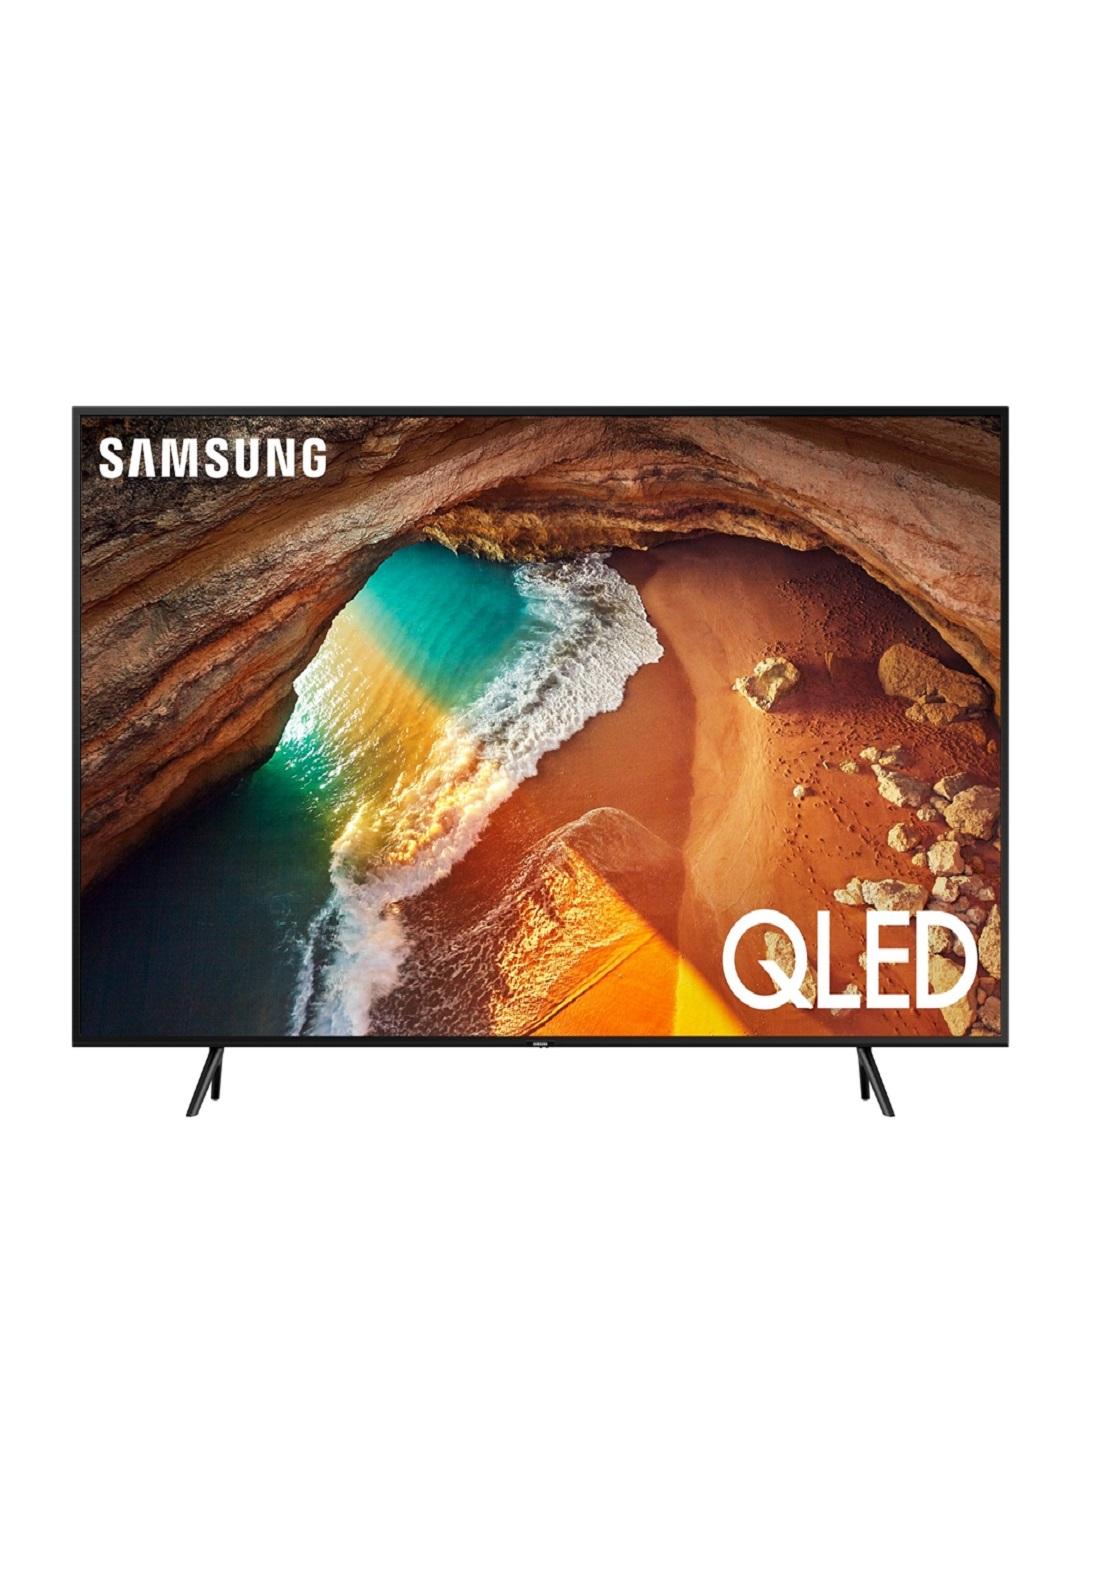 Samsung Q60R QLED Smart 4K UHD TV 65 شاشة تلفاز